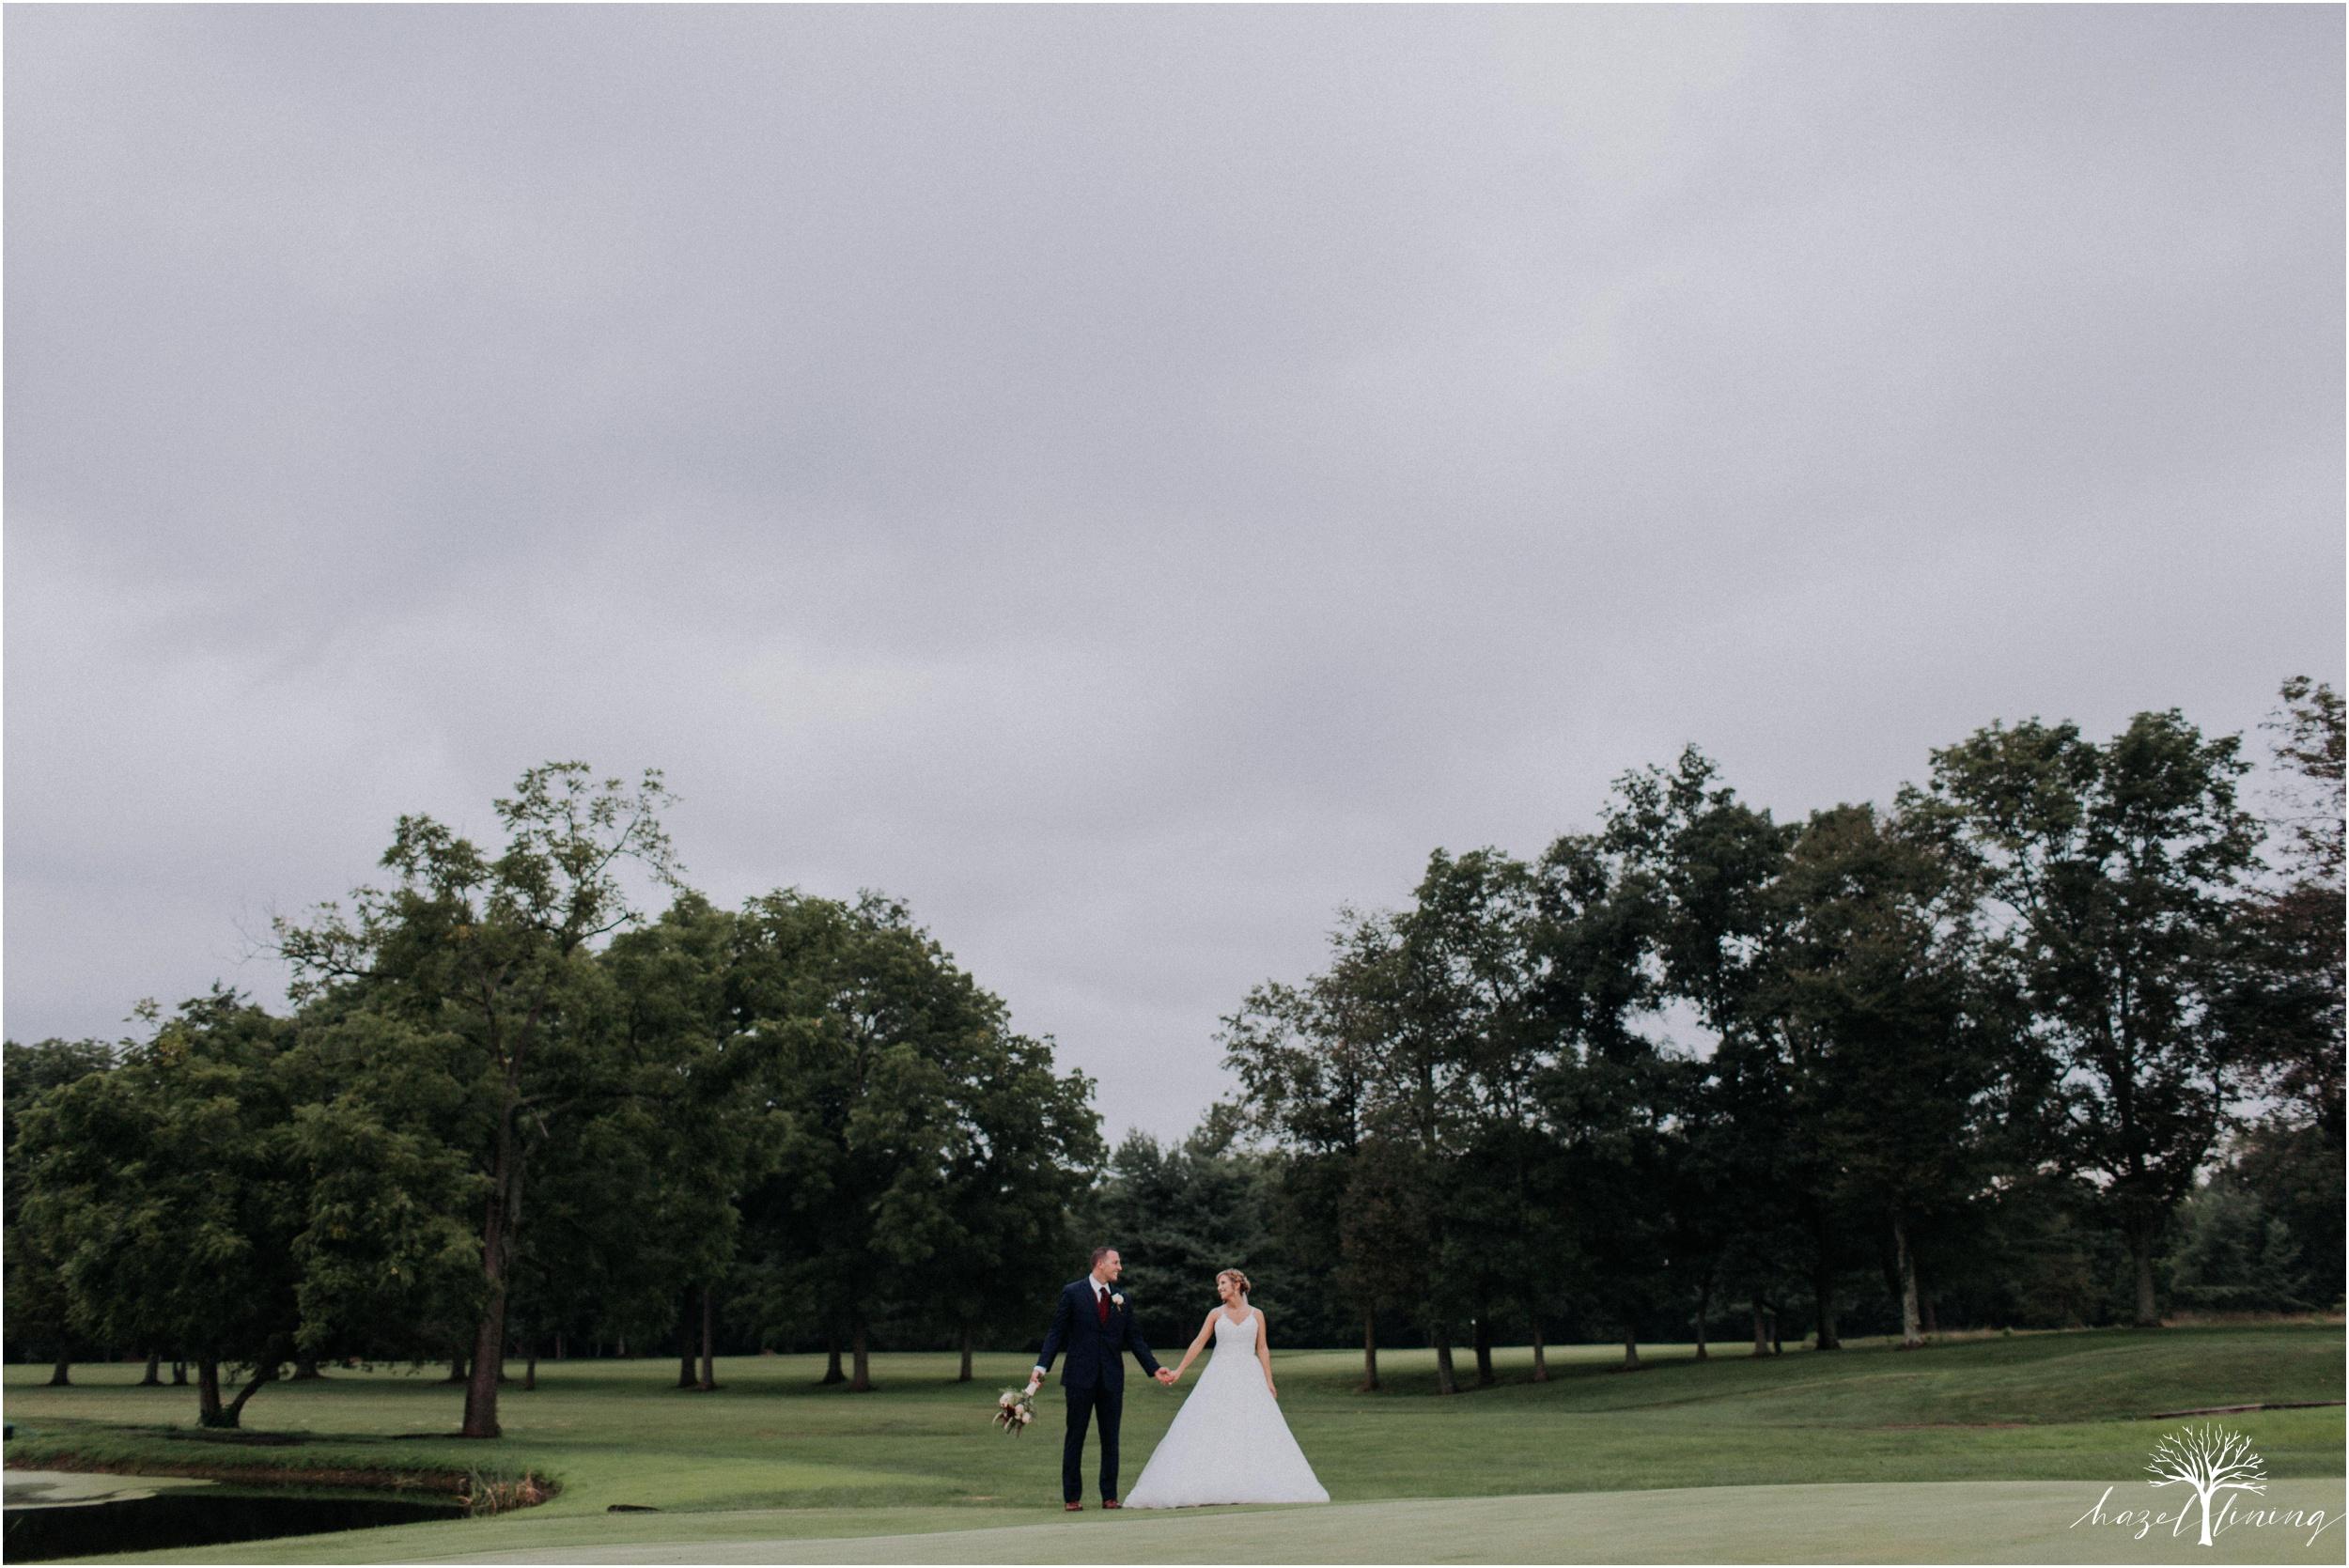 jonathan-weibel-becky-haywood-loft-at-sweetwater-cc-pennsburg-pennsylvania-rainy-day-summer-wedding-hazel-lining-travel-wedding-elopement-photography_0096.jpg